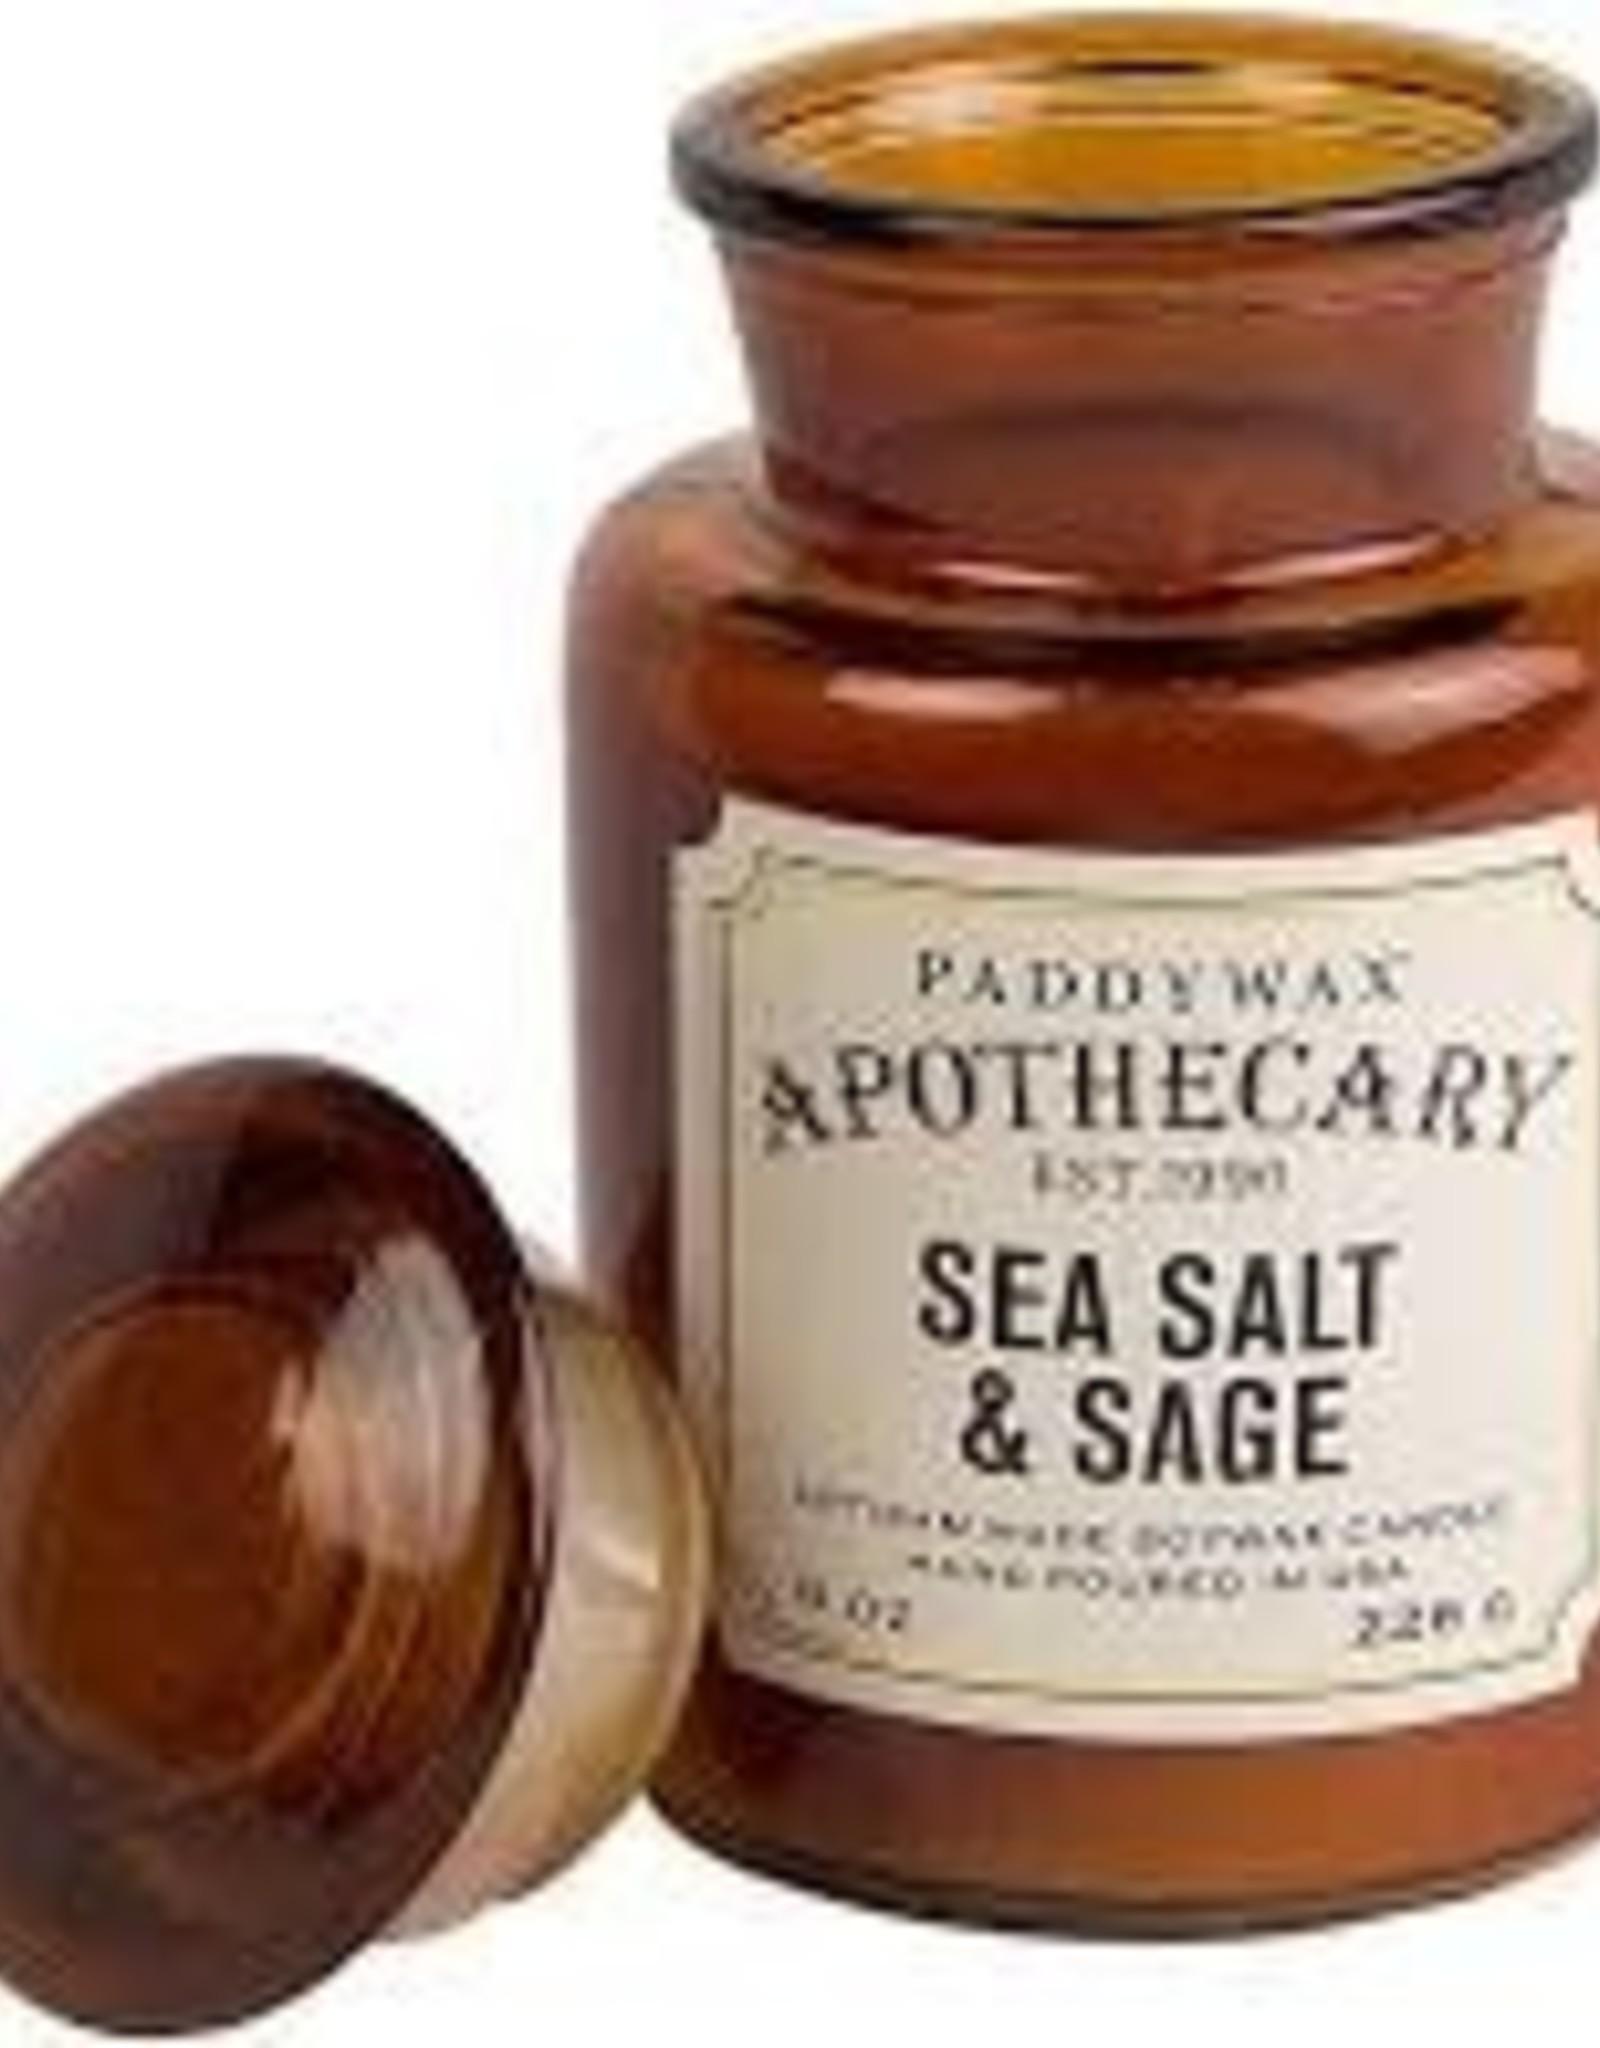 Paddy Wax PADDYWAX APOTHECARY SEA SALT & SAGE